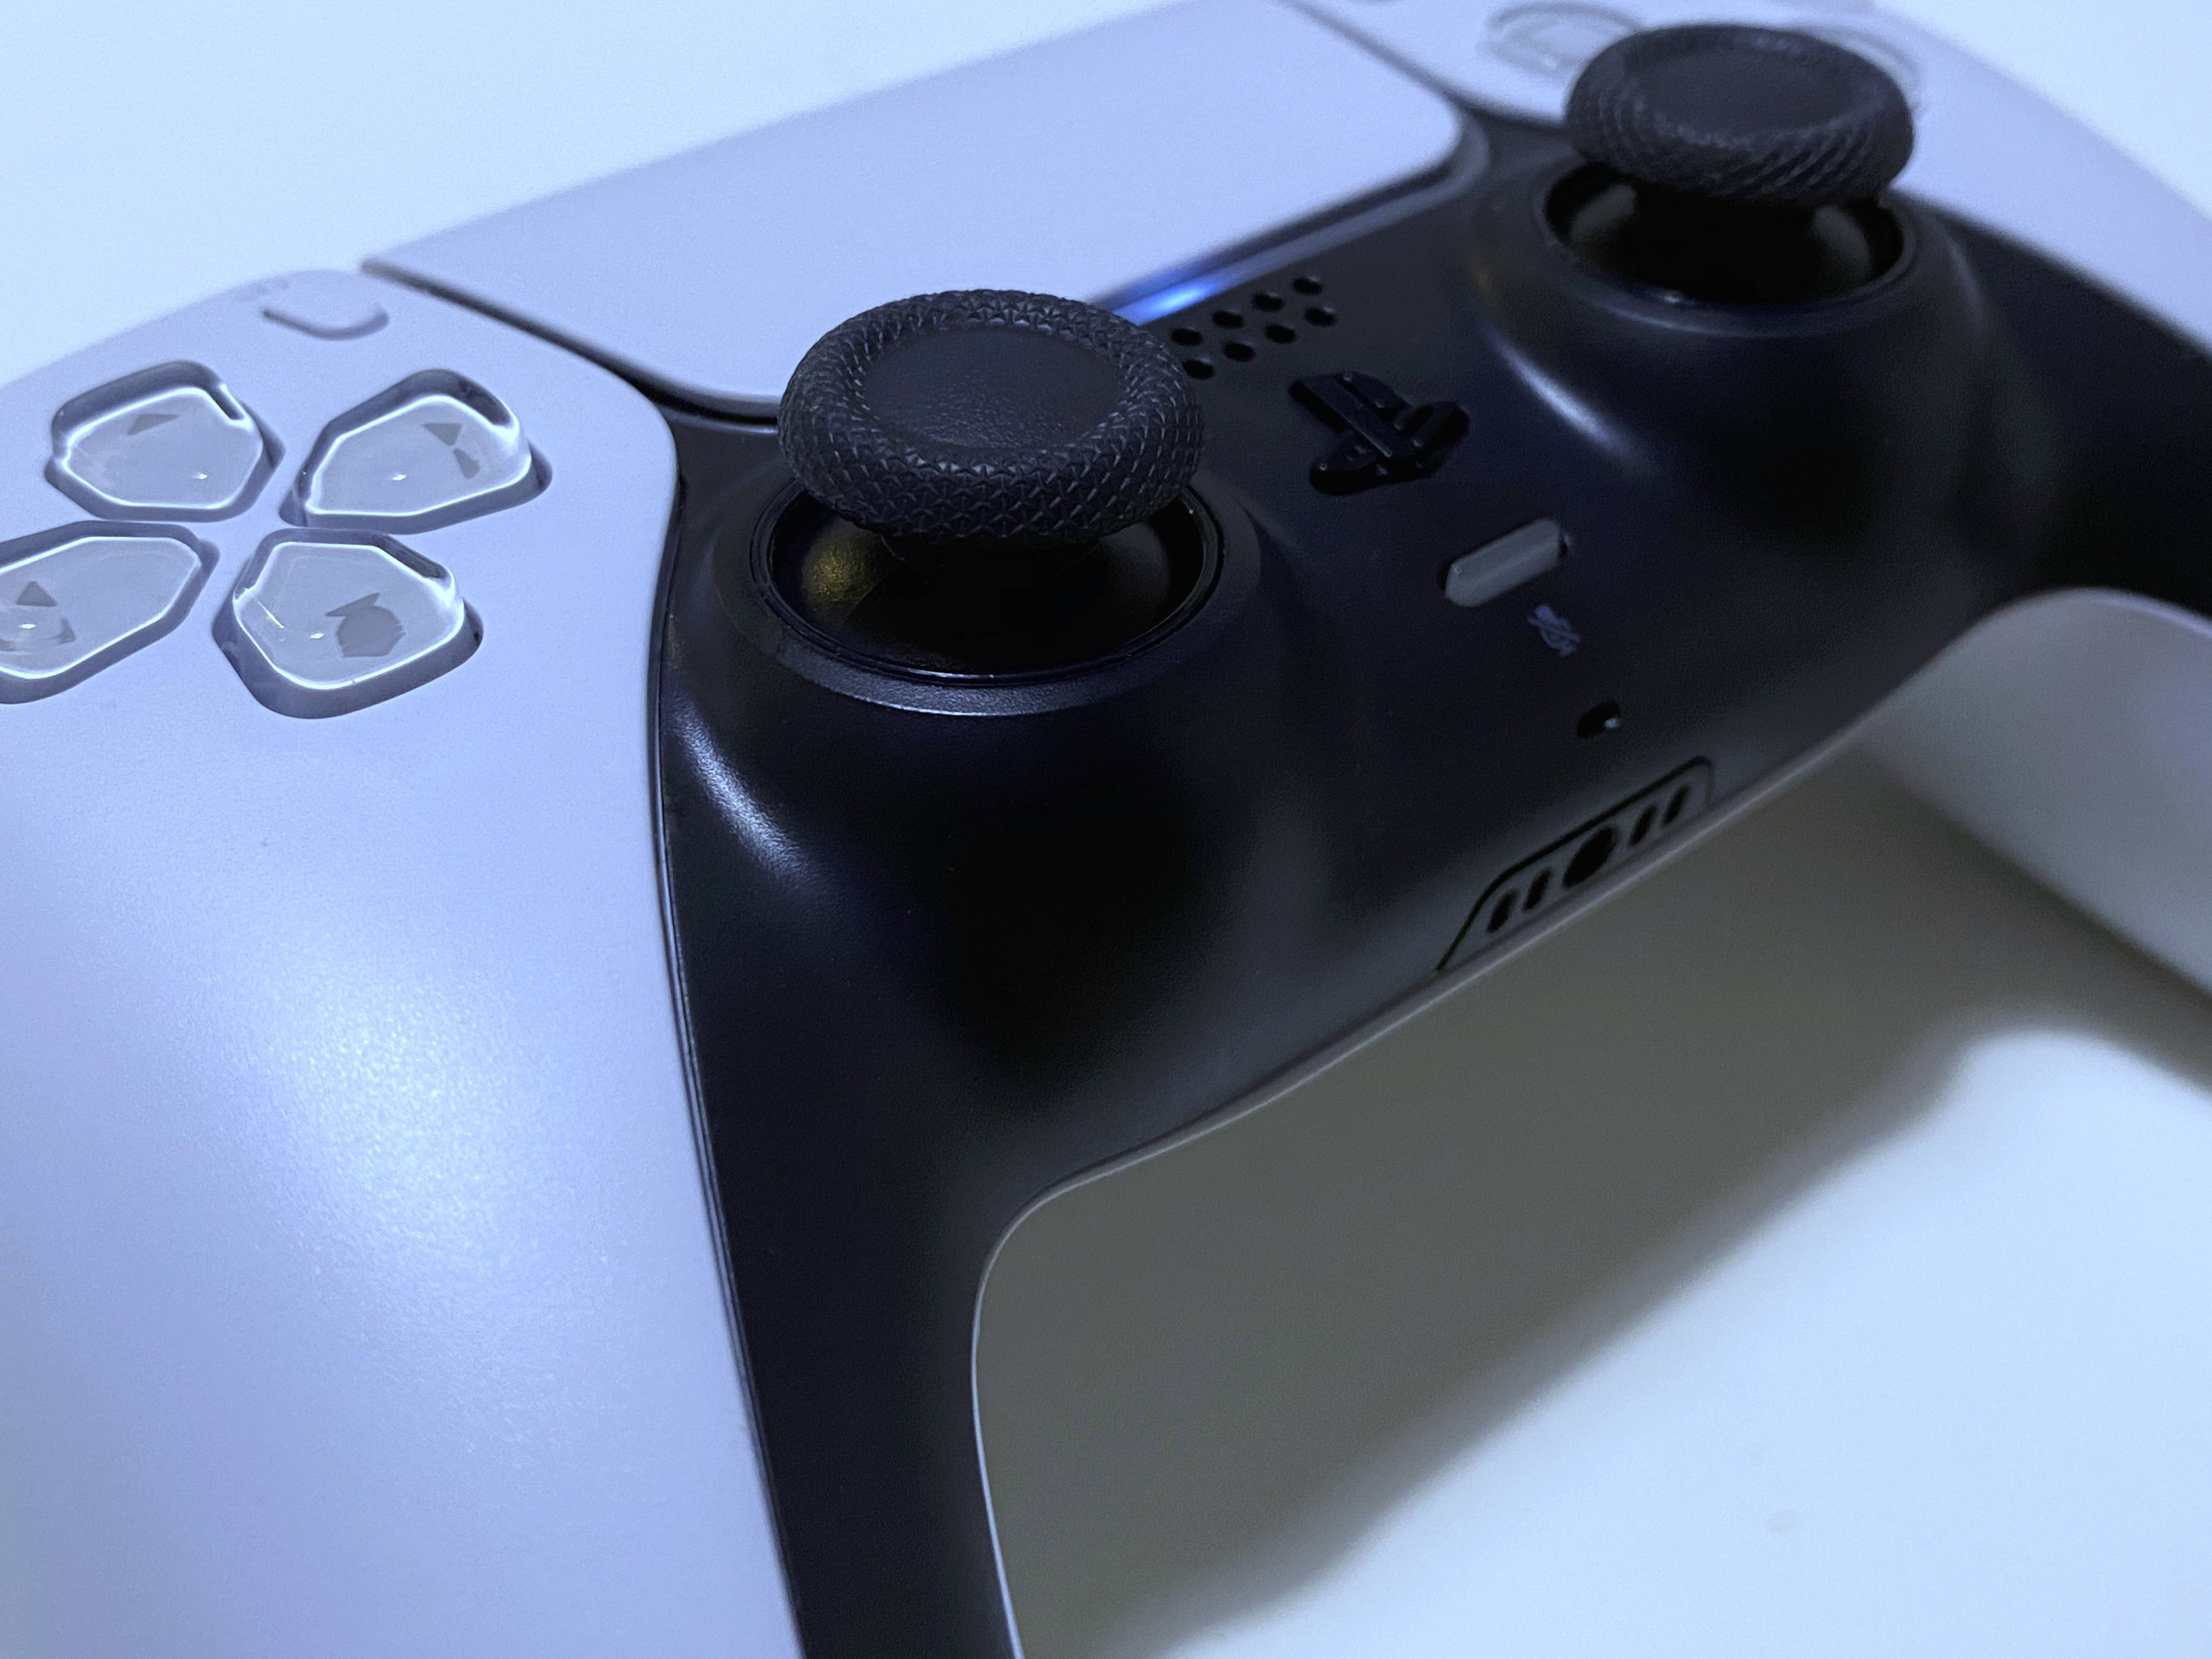 dualsense playstation 5 ps5